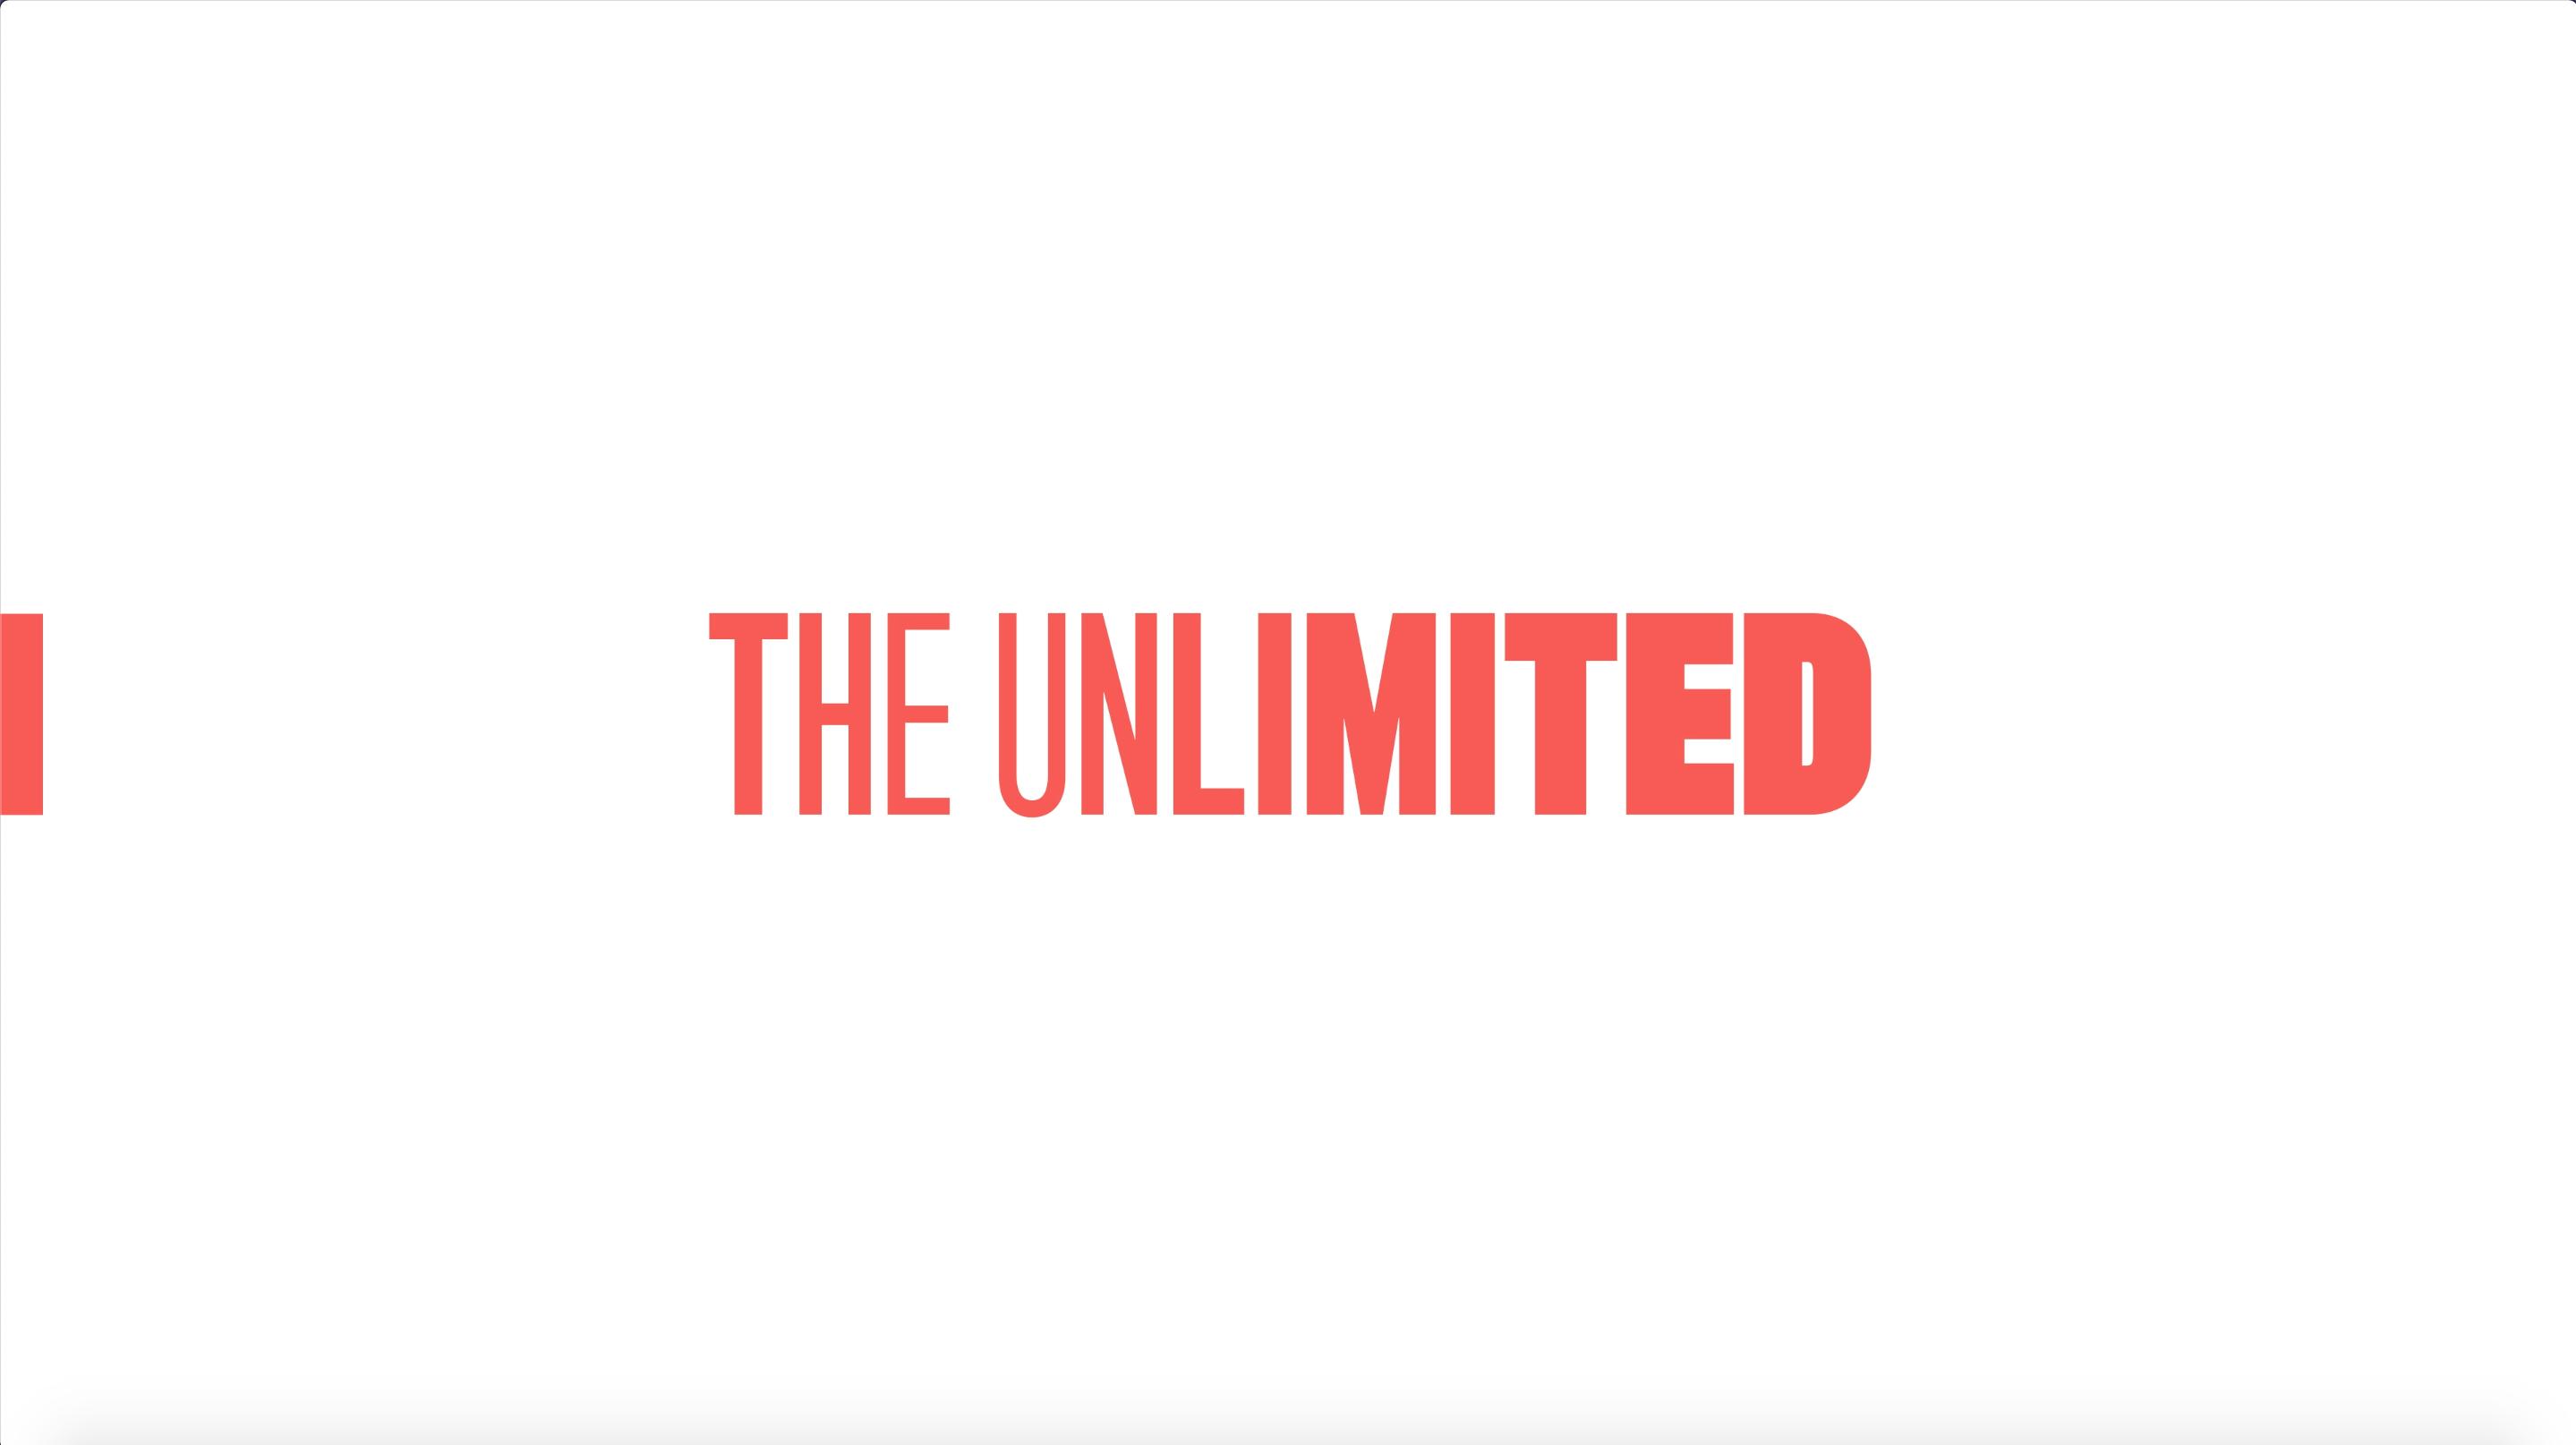 Joe Public United Creates a Bold New 'Unlimited' Identity